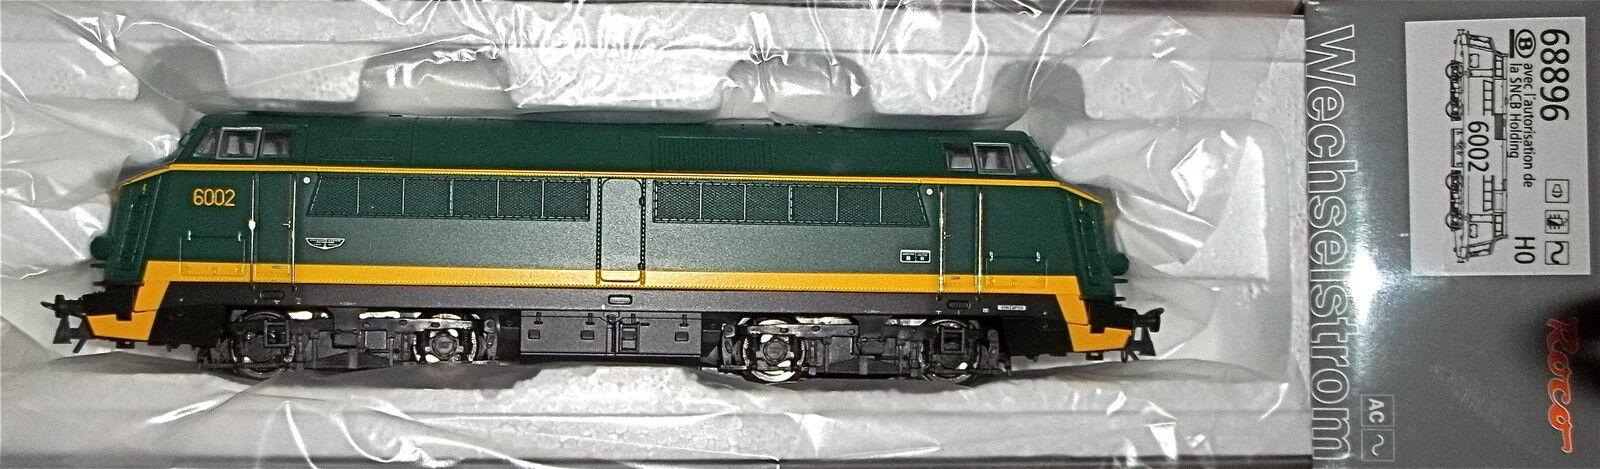 Serie 60 Sncb Nmbs Ep. III Locomotiva Diesel Sound Digitale Ac Roco 68896 1:87